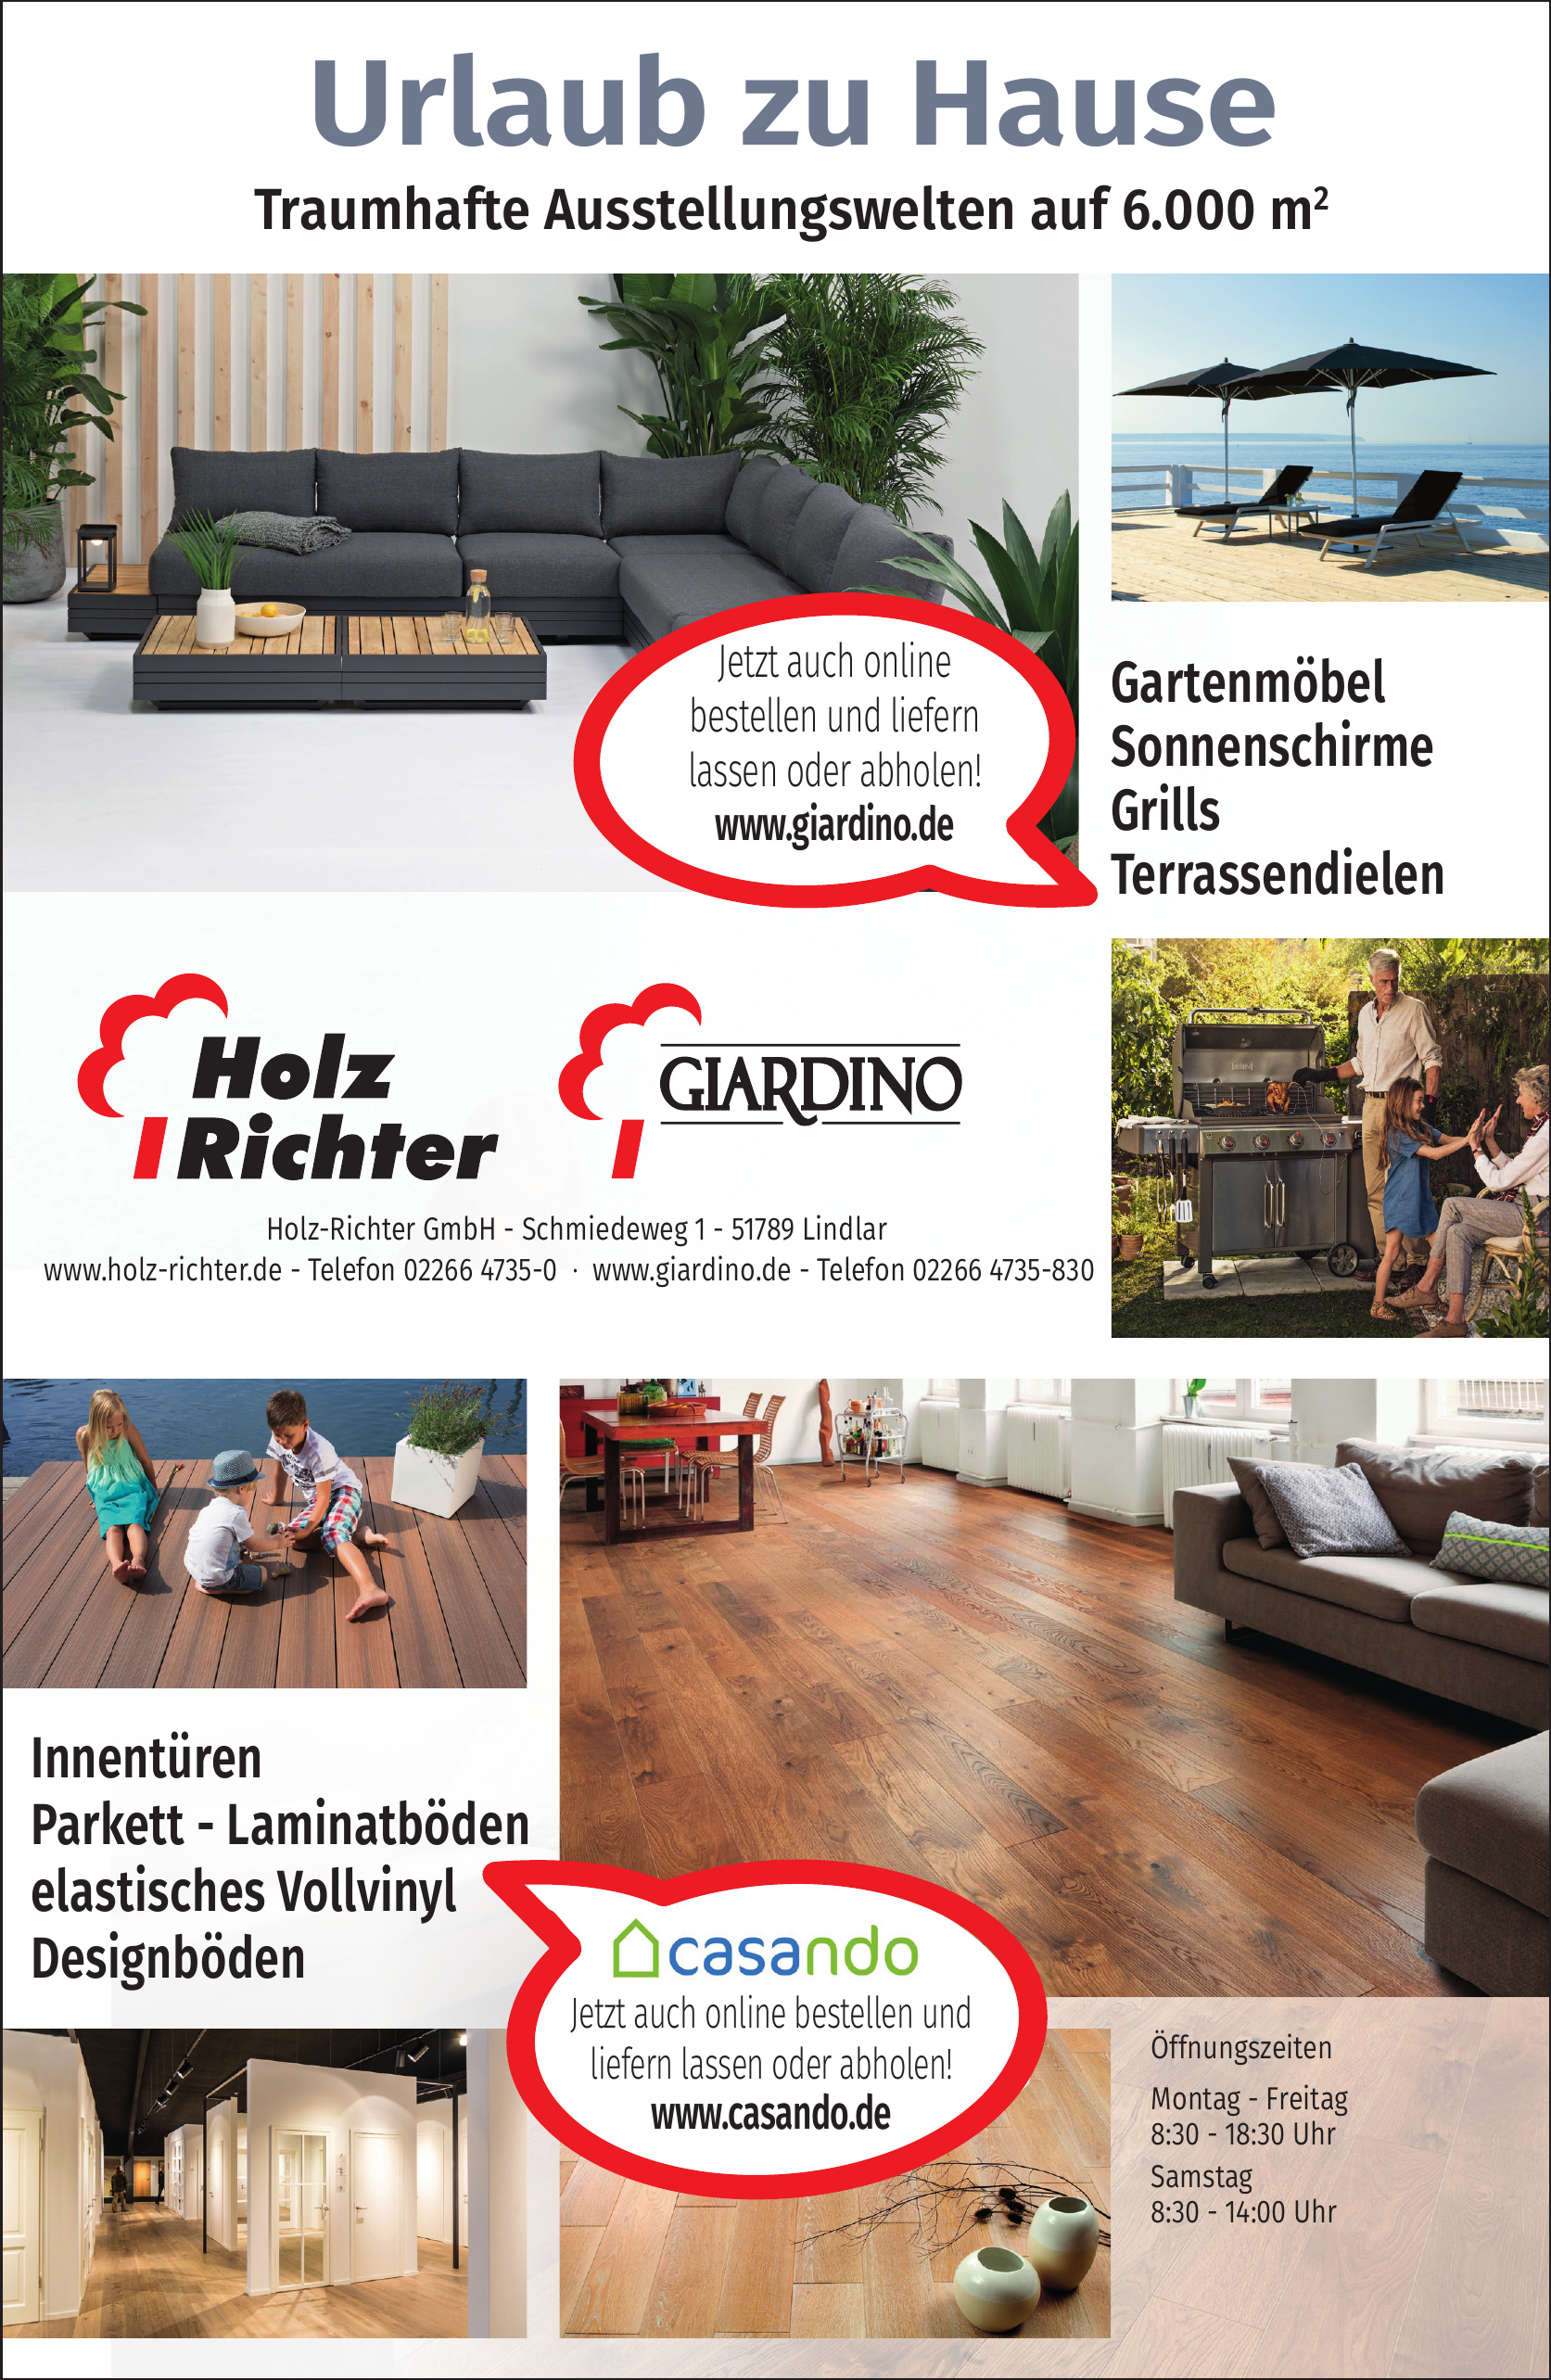 Holz Richter GmbH